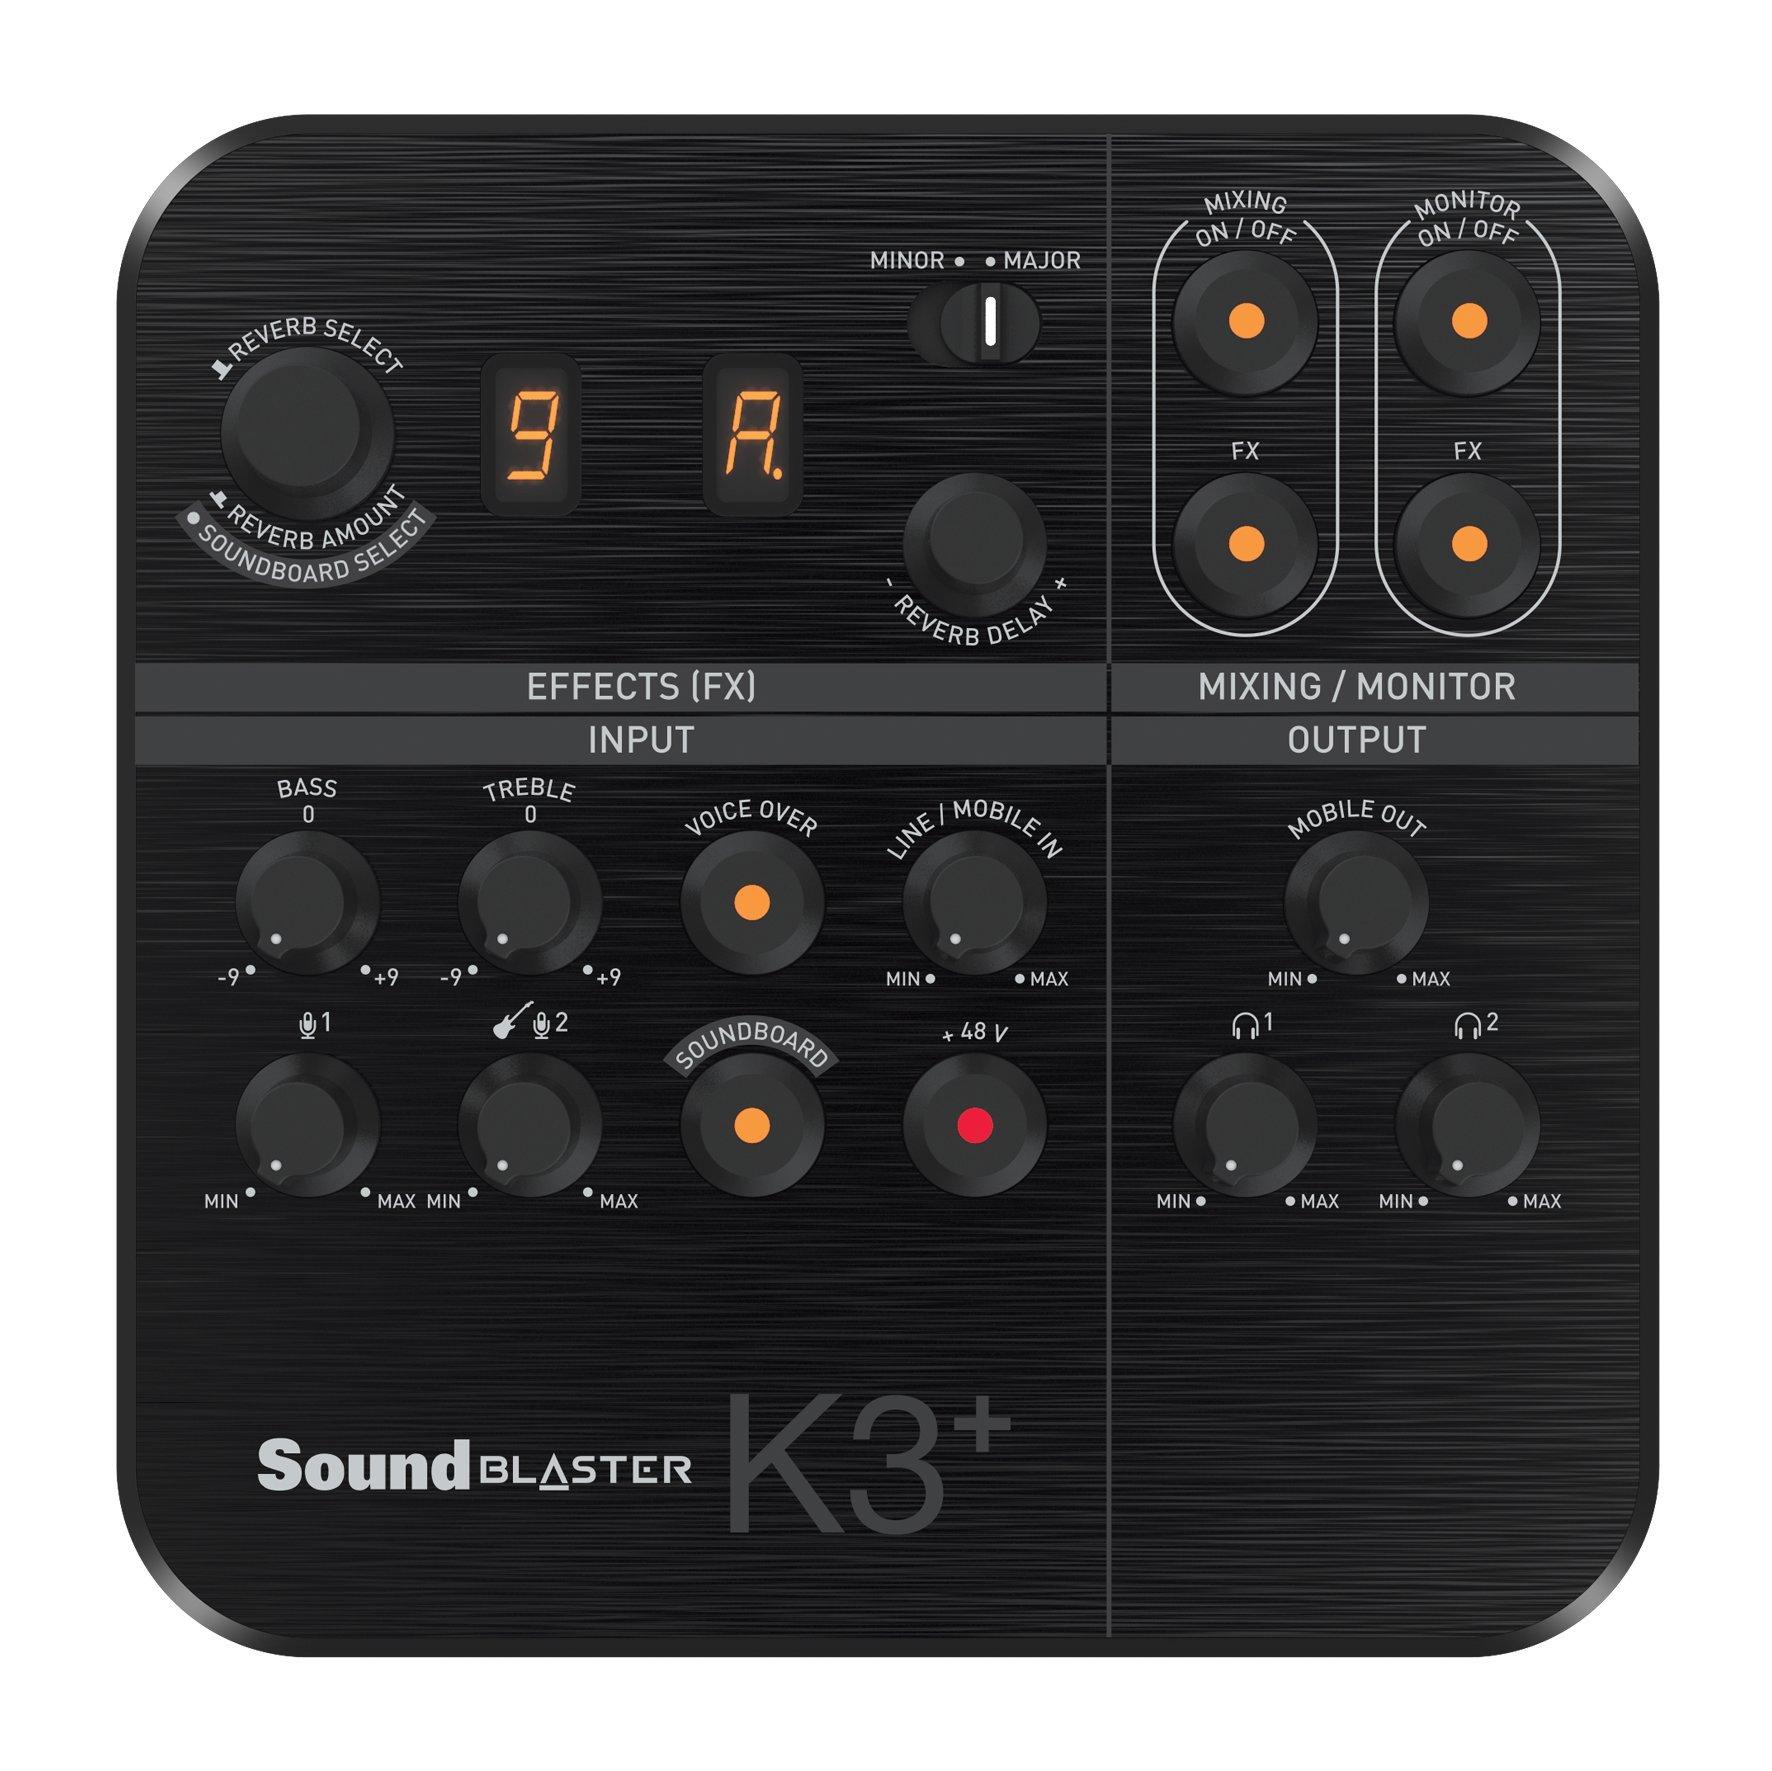 Creative Sound Blaster K3+ USB Powered 2 Channel Digital Mixer AMP/DAC/, Digital Effects XLR Inputs with Phantom Power / TRS / Z Line Inputs